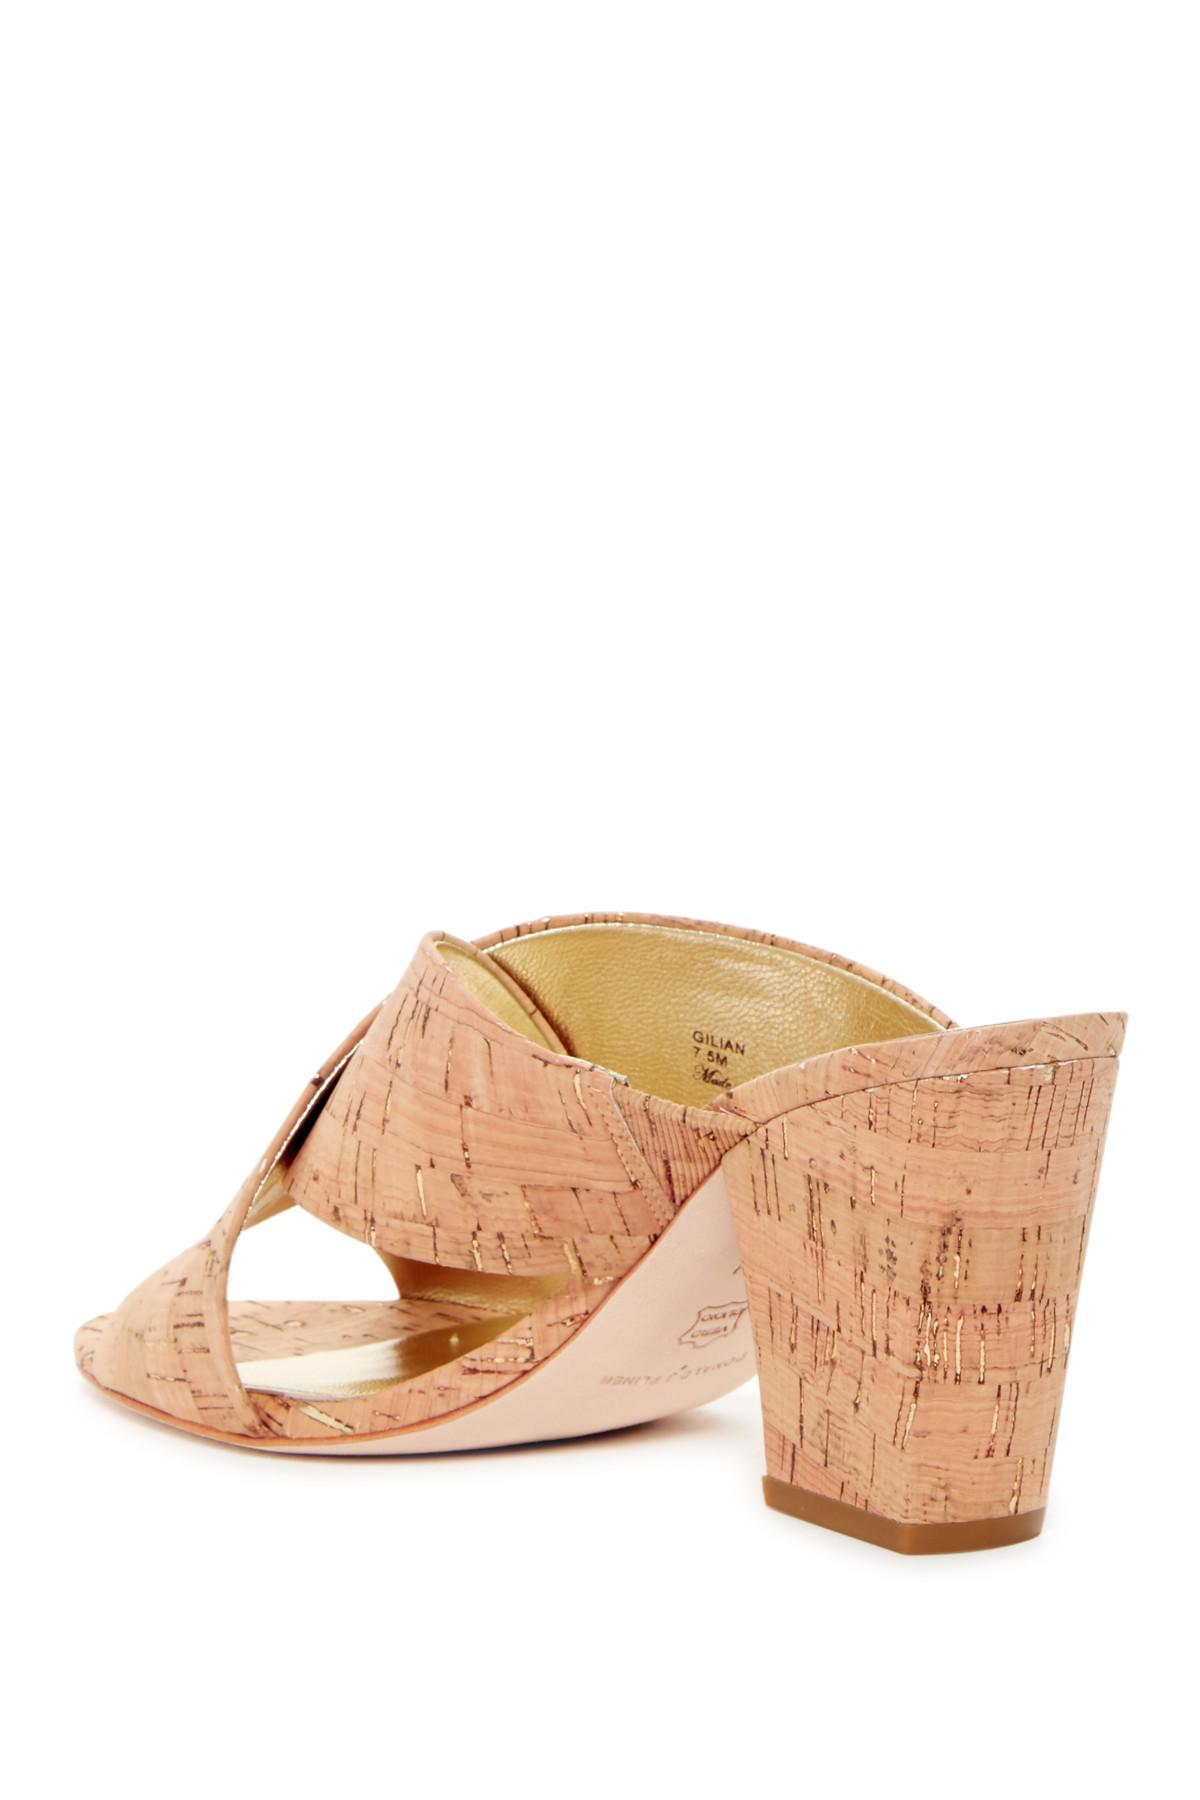 42aa56c5f48 Lyst donald pliner gilian cork slide sandal jpg 1200x1800 Donald pliner  slide sandals